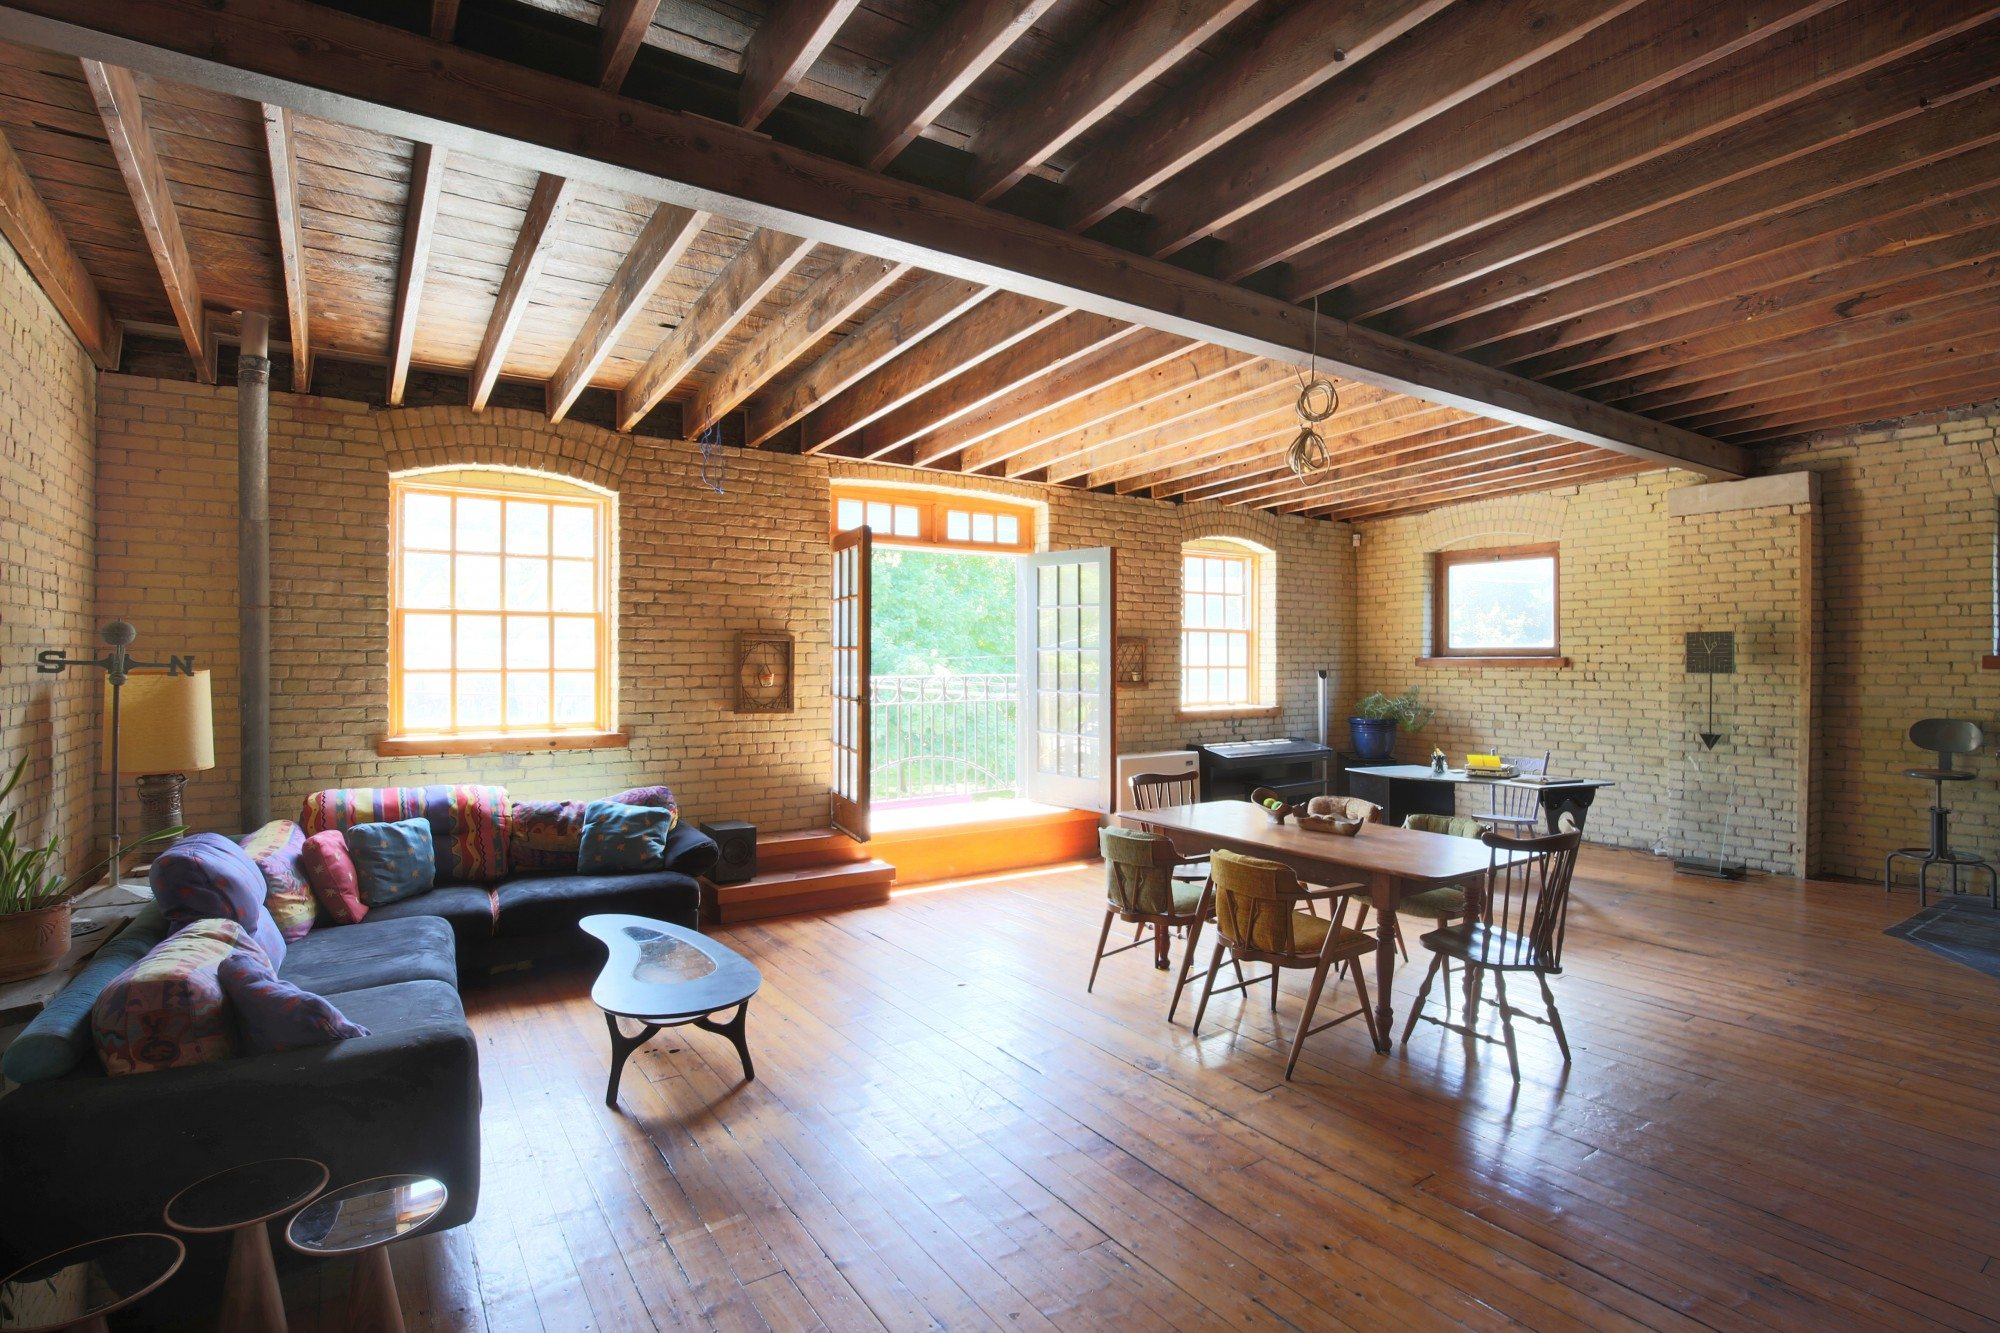 toronto-house-for-sale-154-shuter-street-8